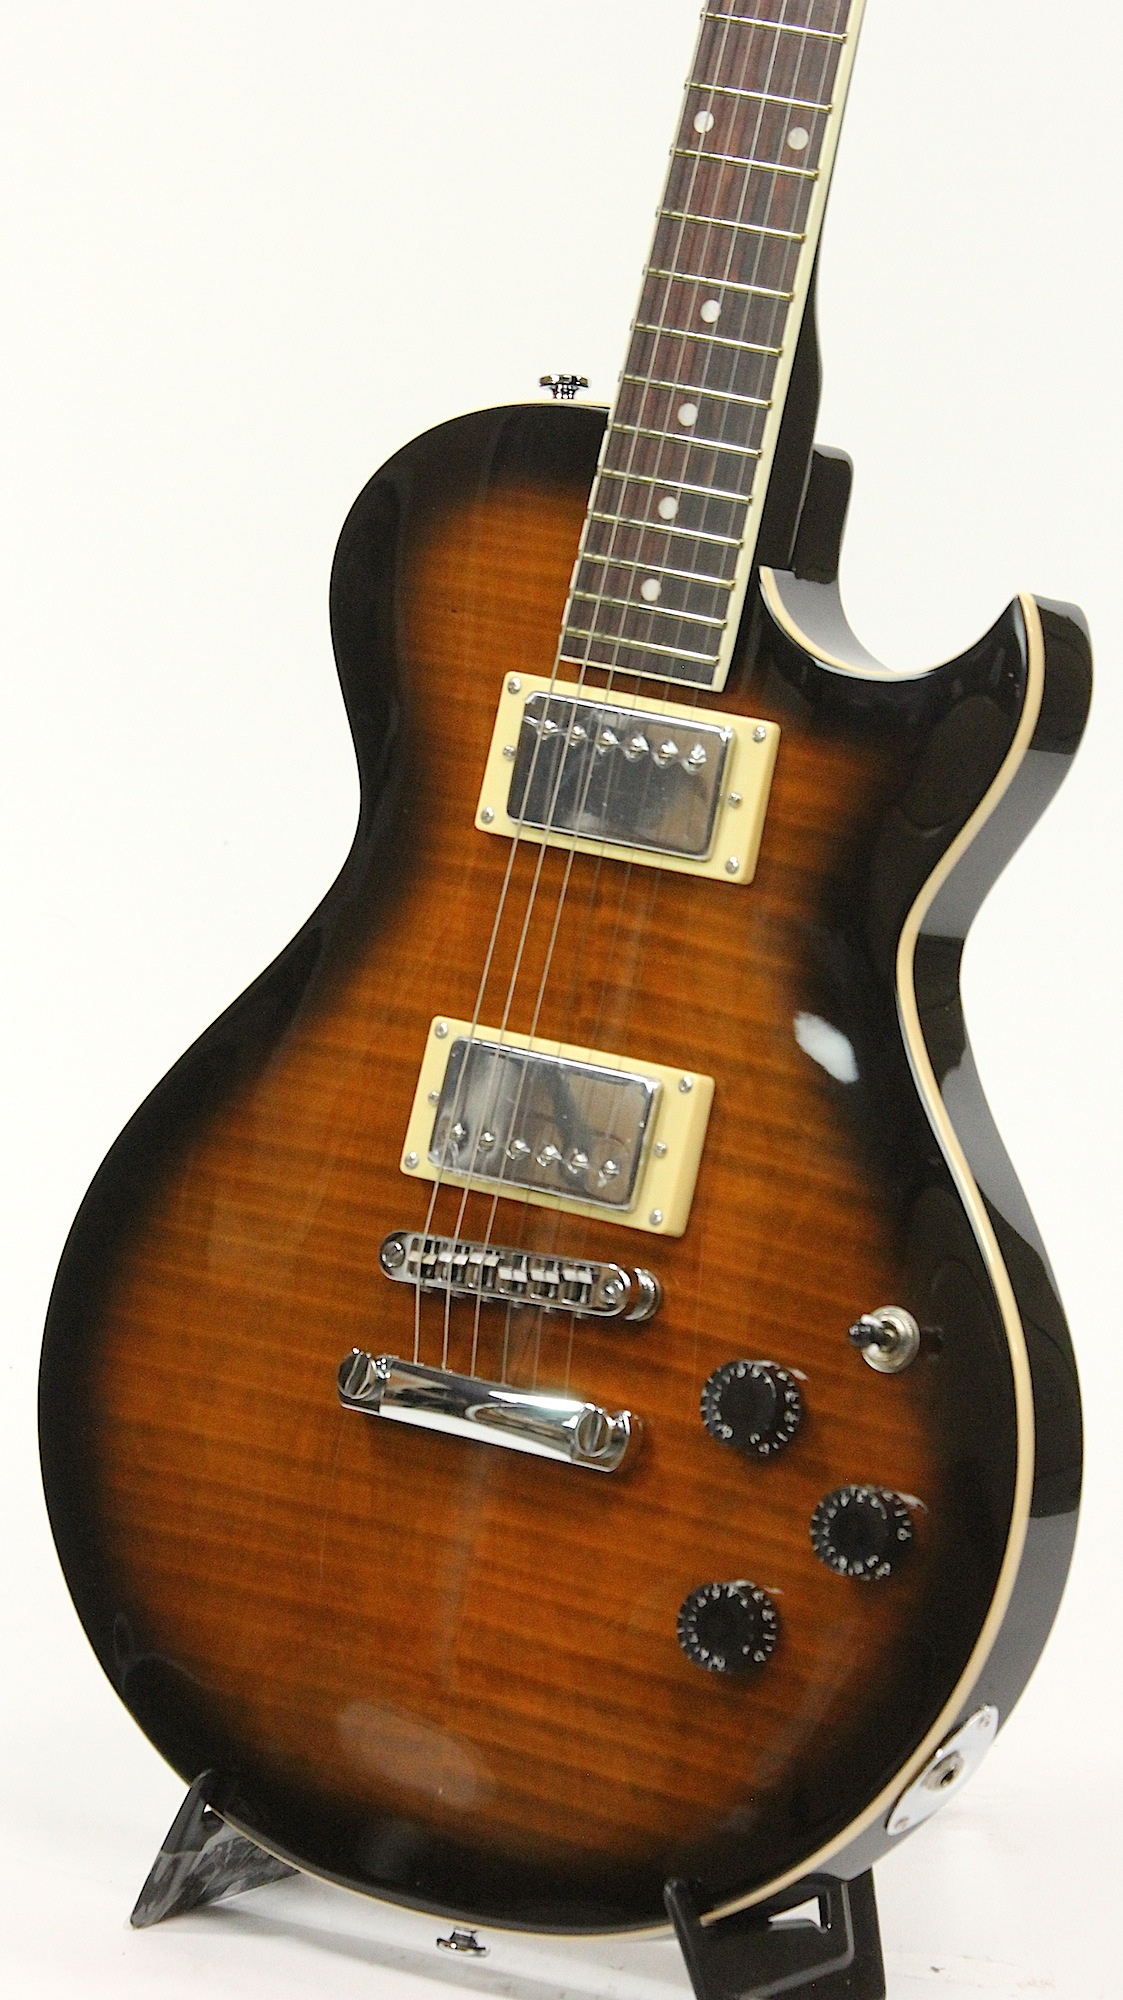 ibanez gio gart60fasb sunburst electric guitar 6. Black Bedroom Furniture Sets. Home Design Ideas